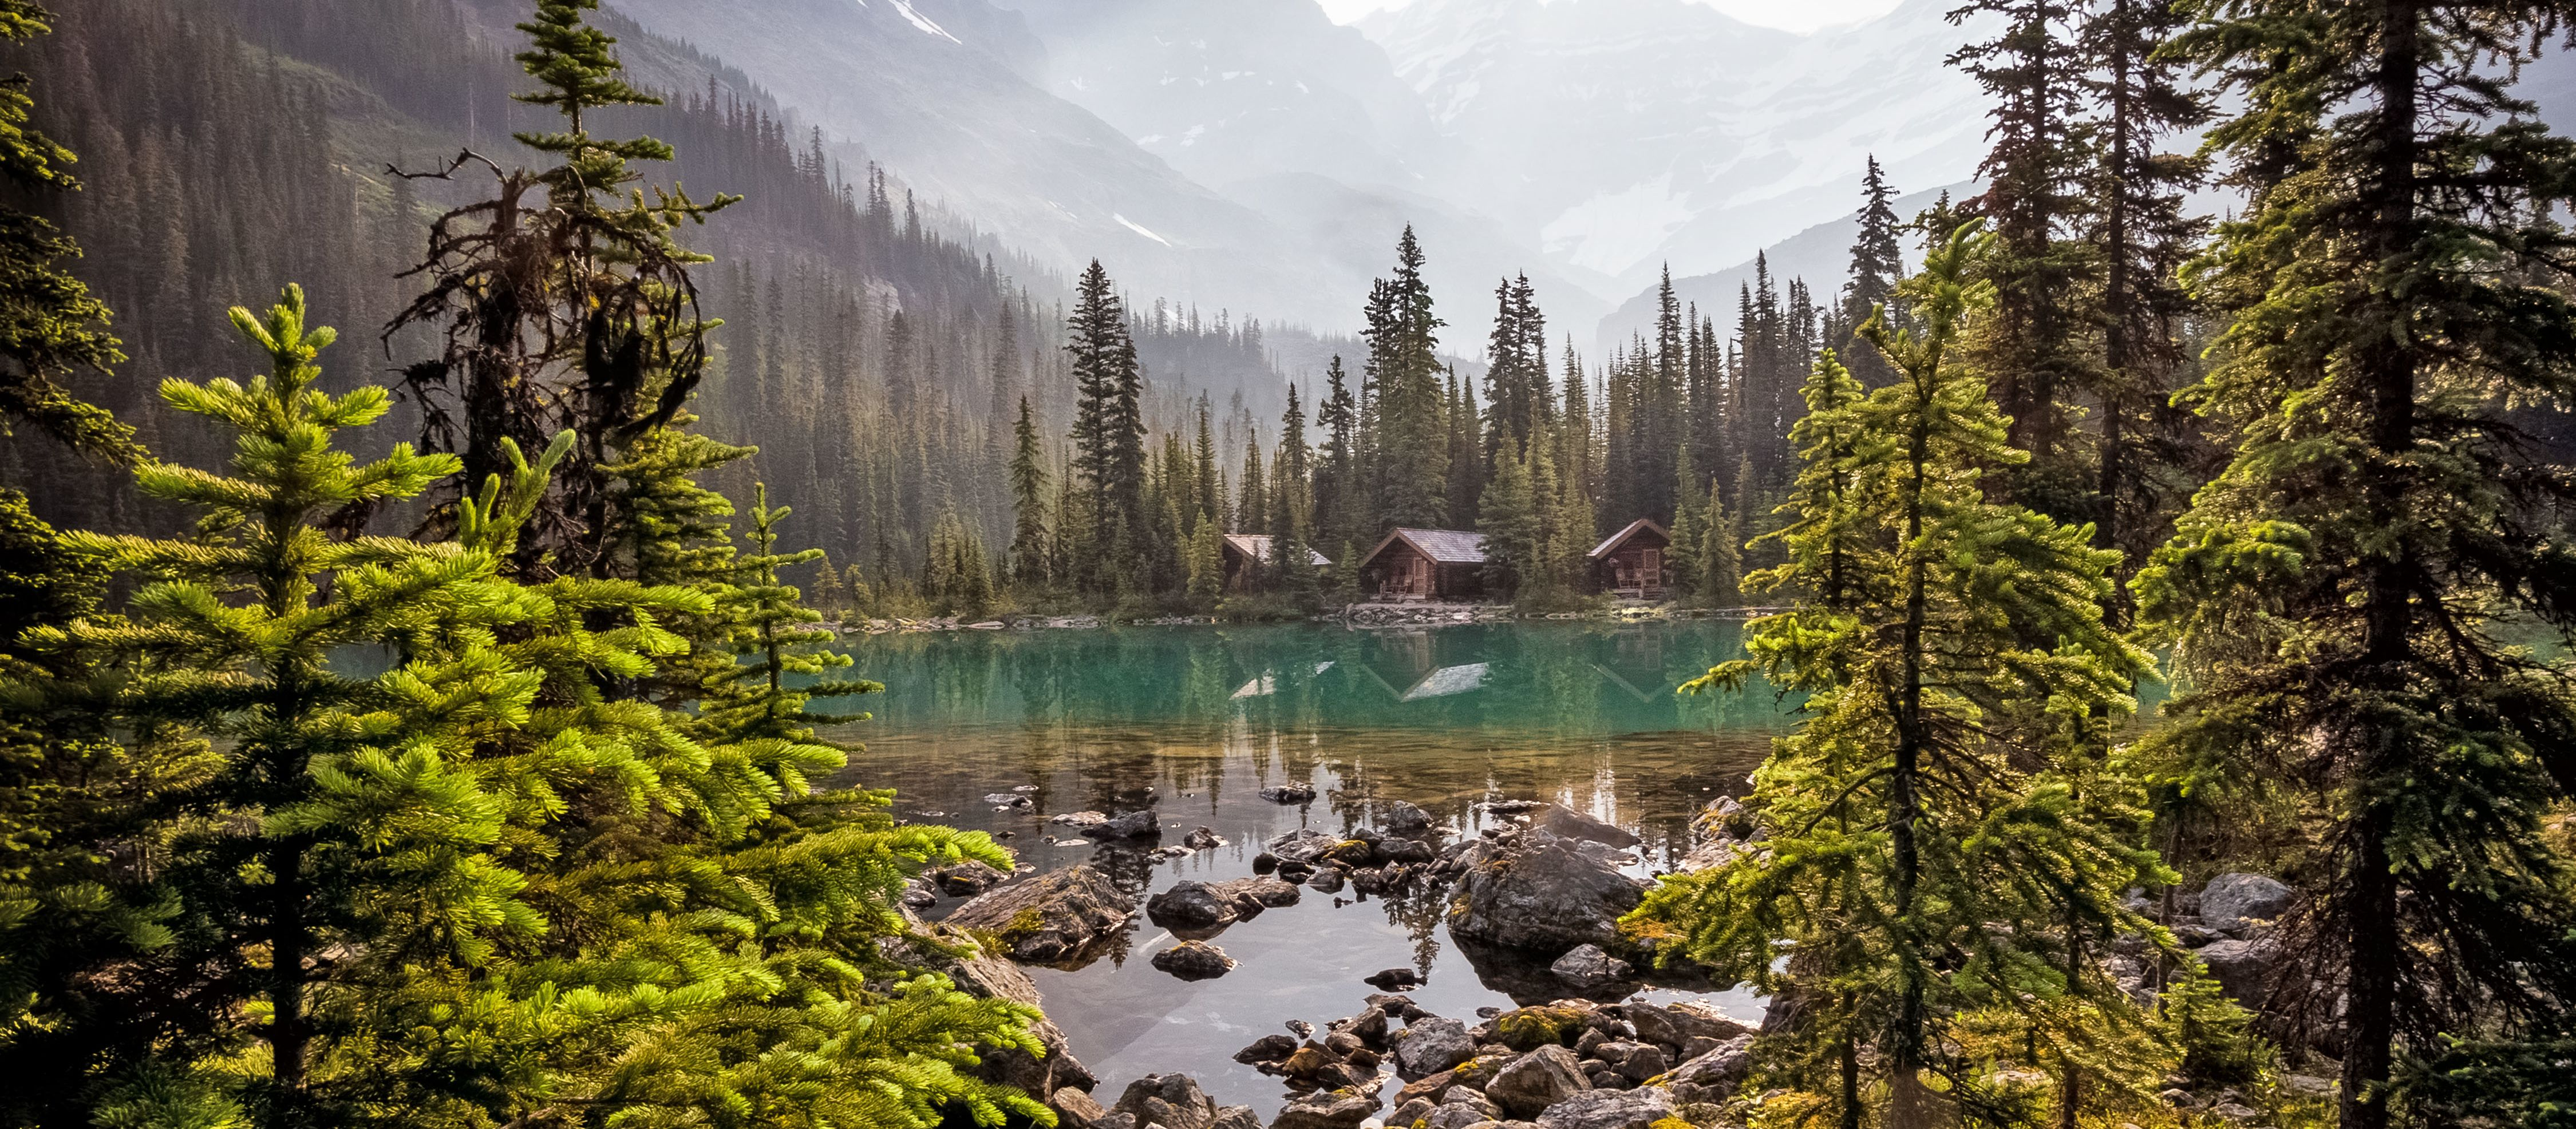 Lake O'Hara Mountains im Yoho National Park, British Columbia